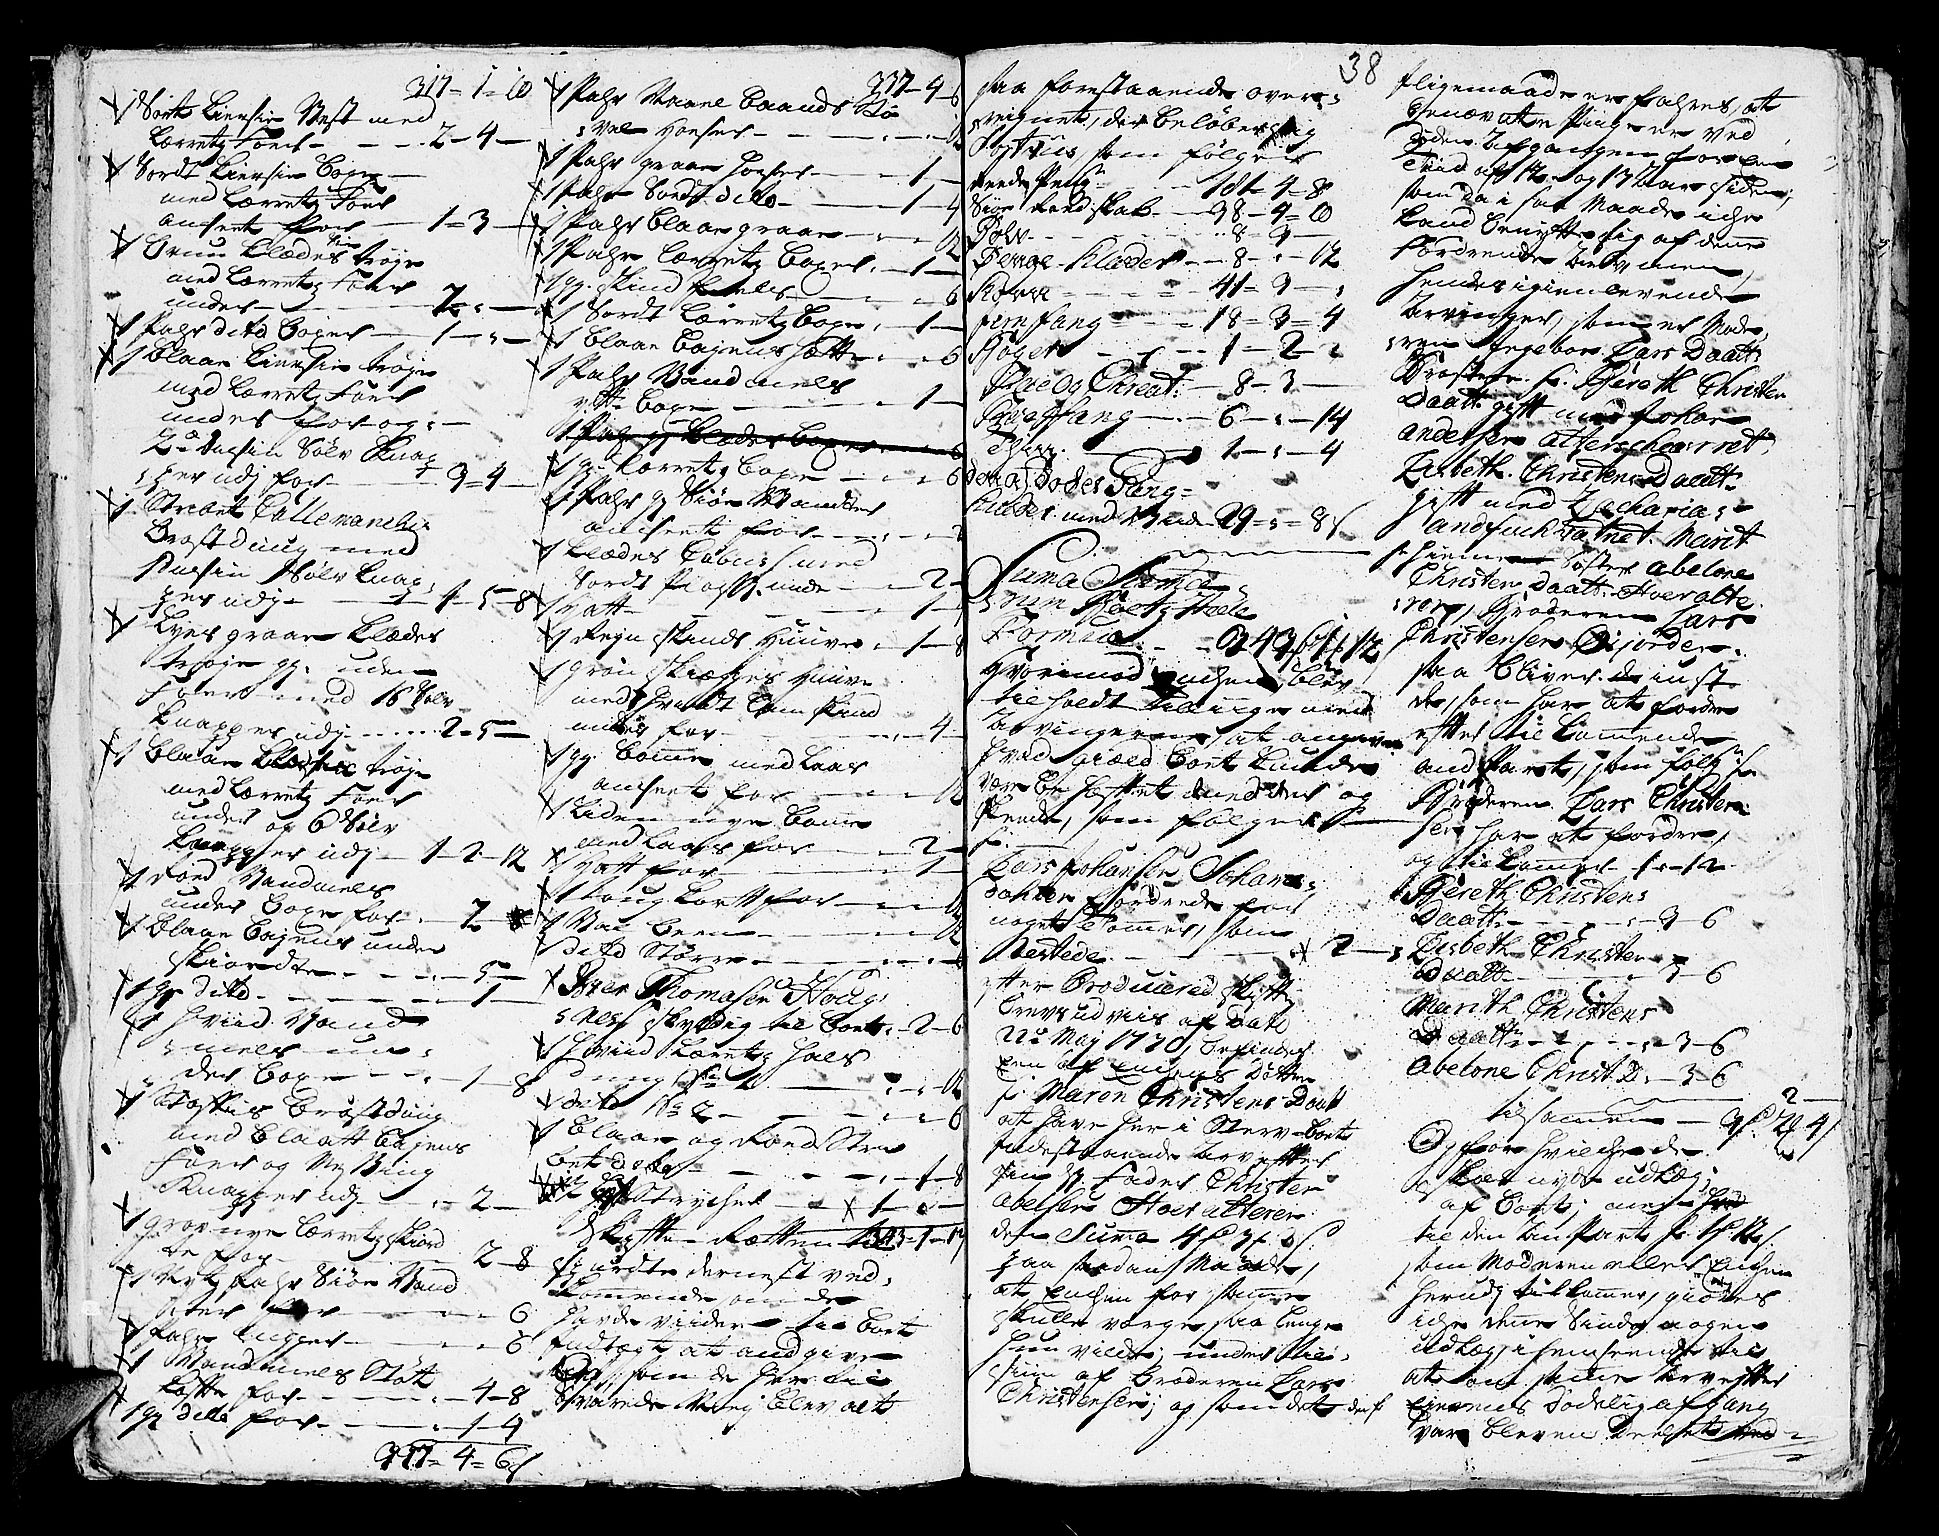 SAT, Helgeland sorenskriveri, 3/3A/L0029: Konseptprotokoll 14, 1753, s. 37b-38a